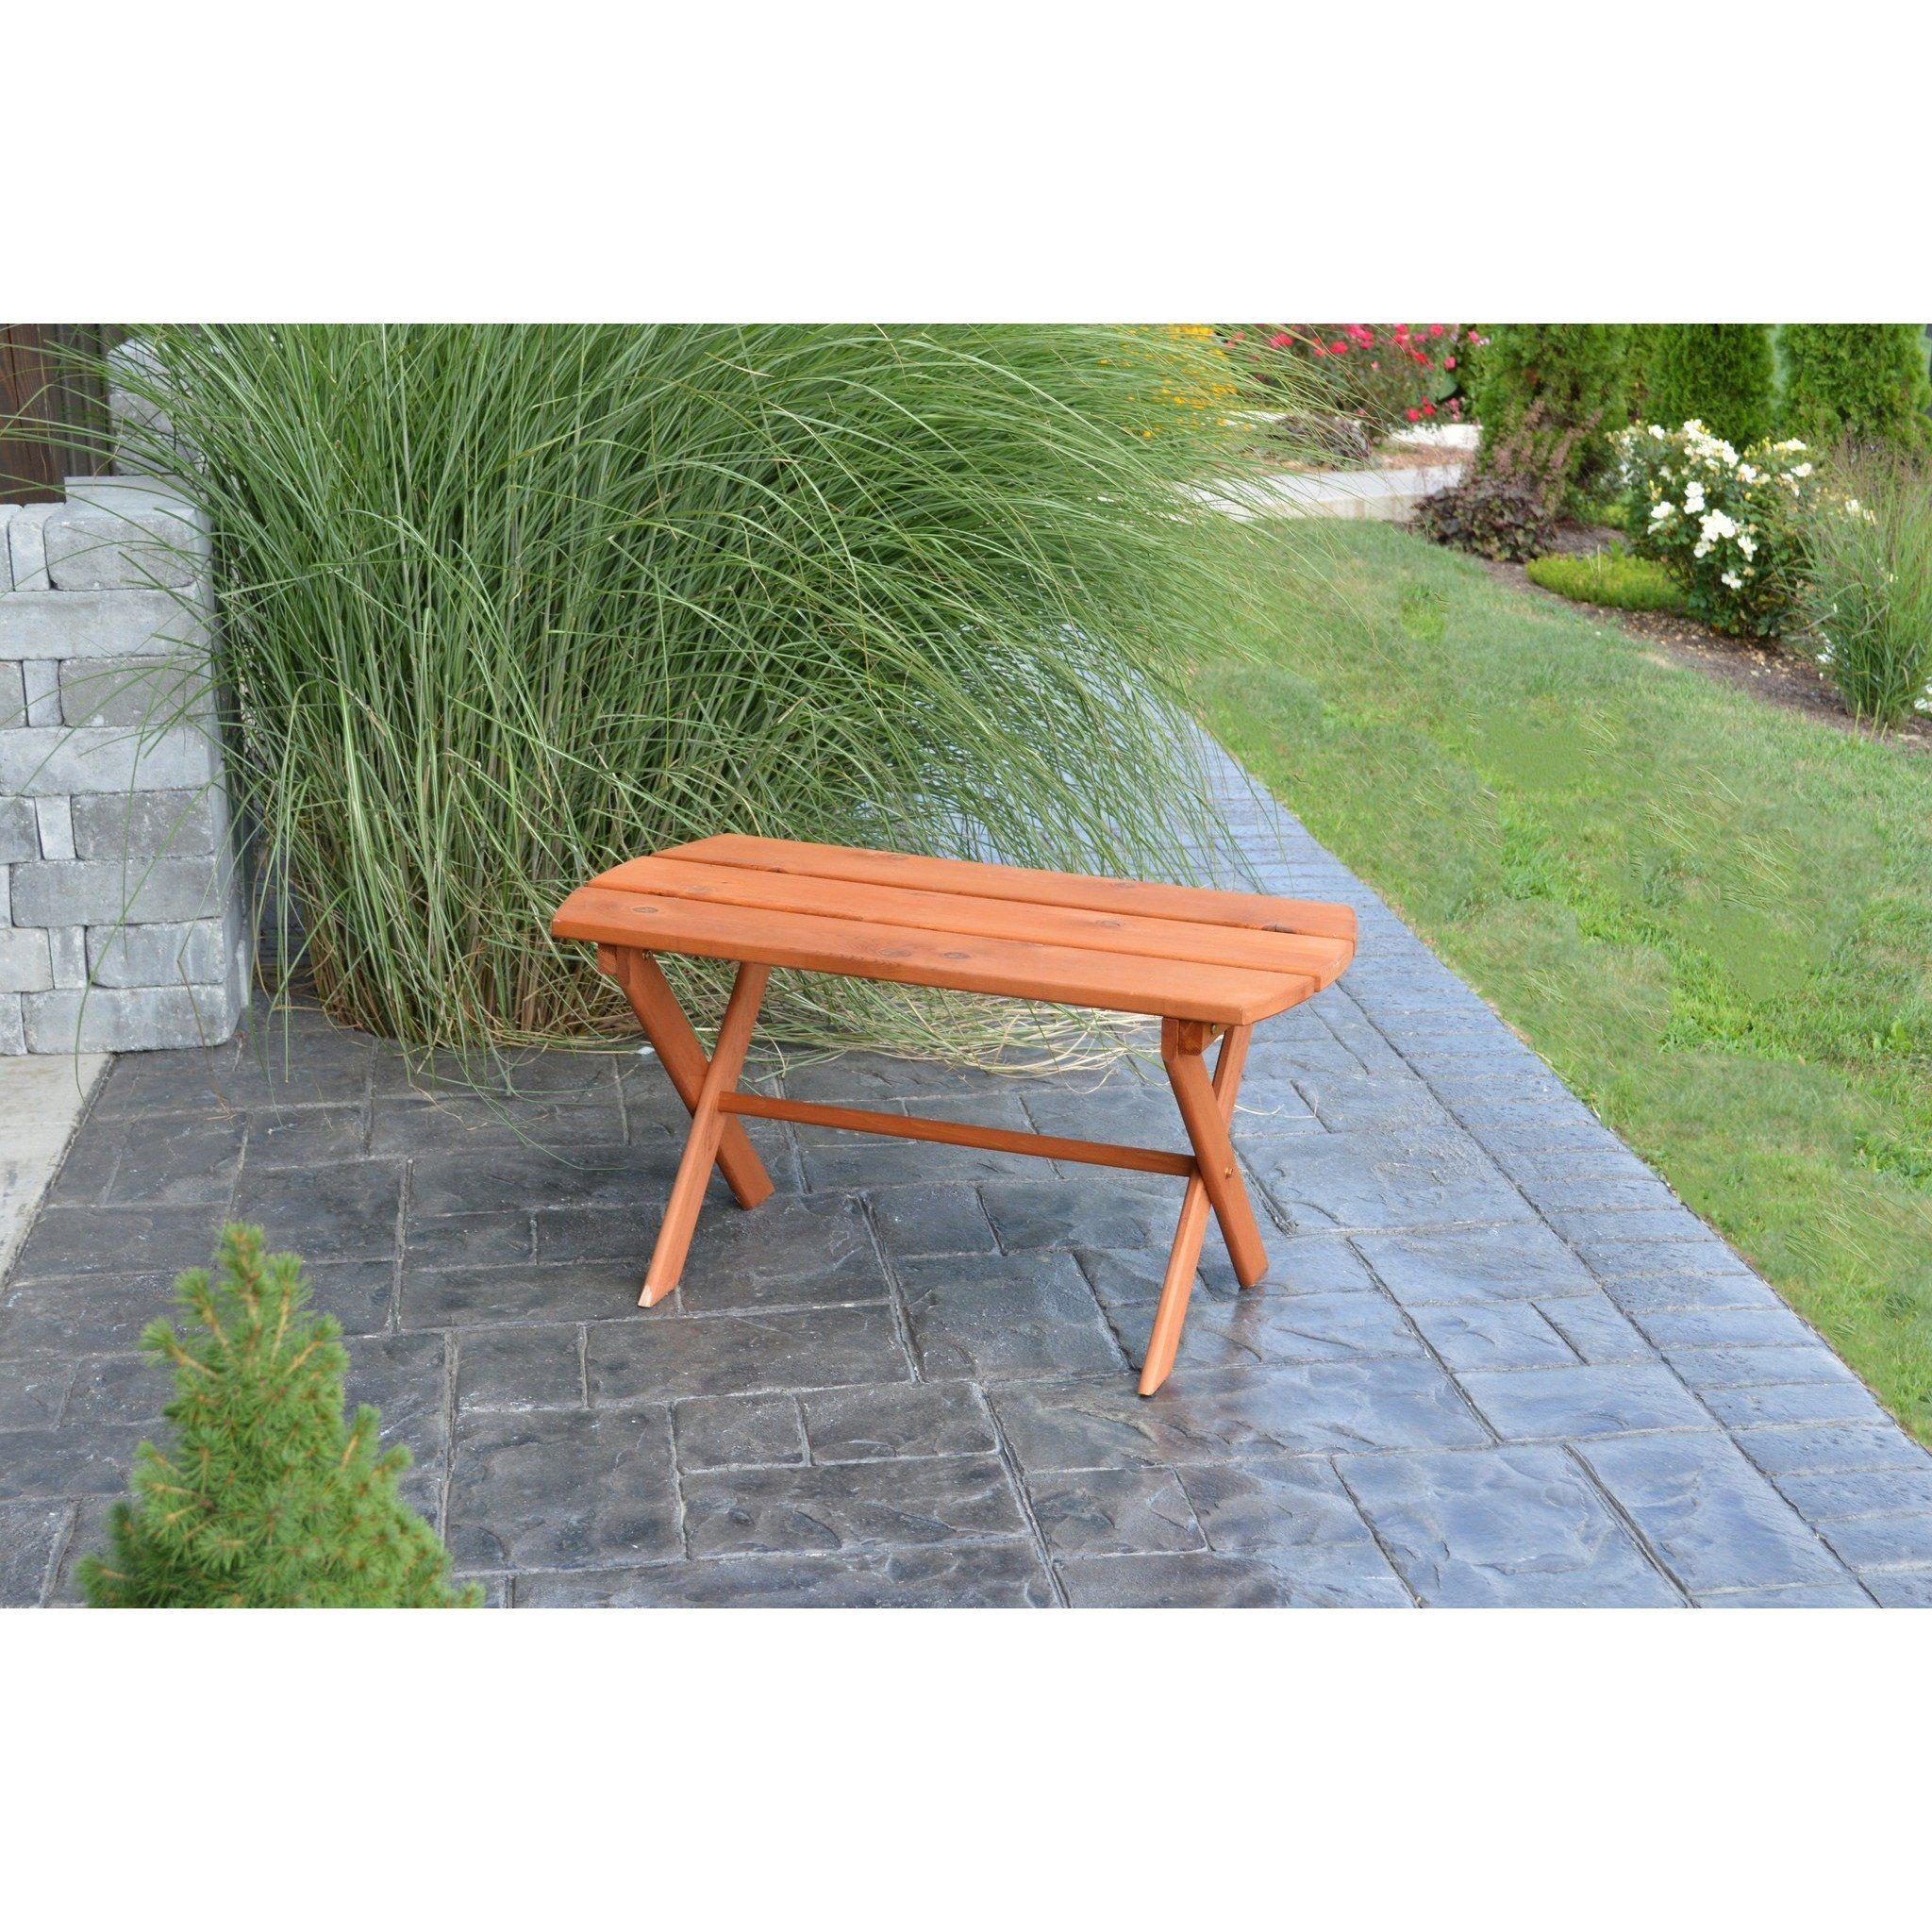 Al furniture co western red cedar folding coffee table